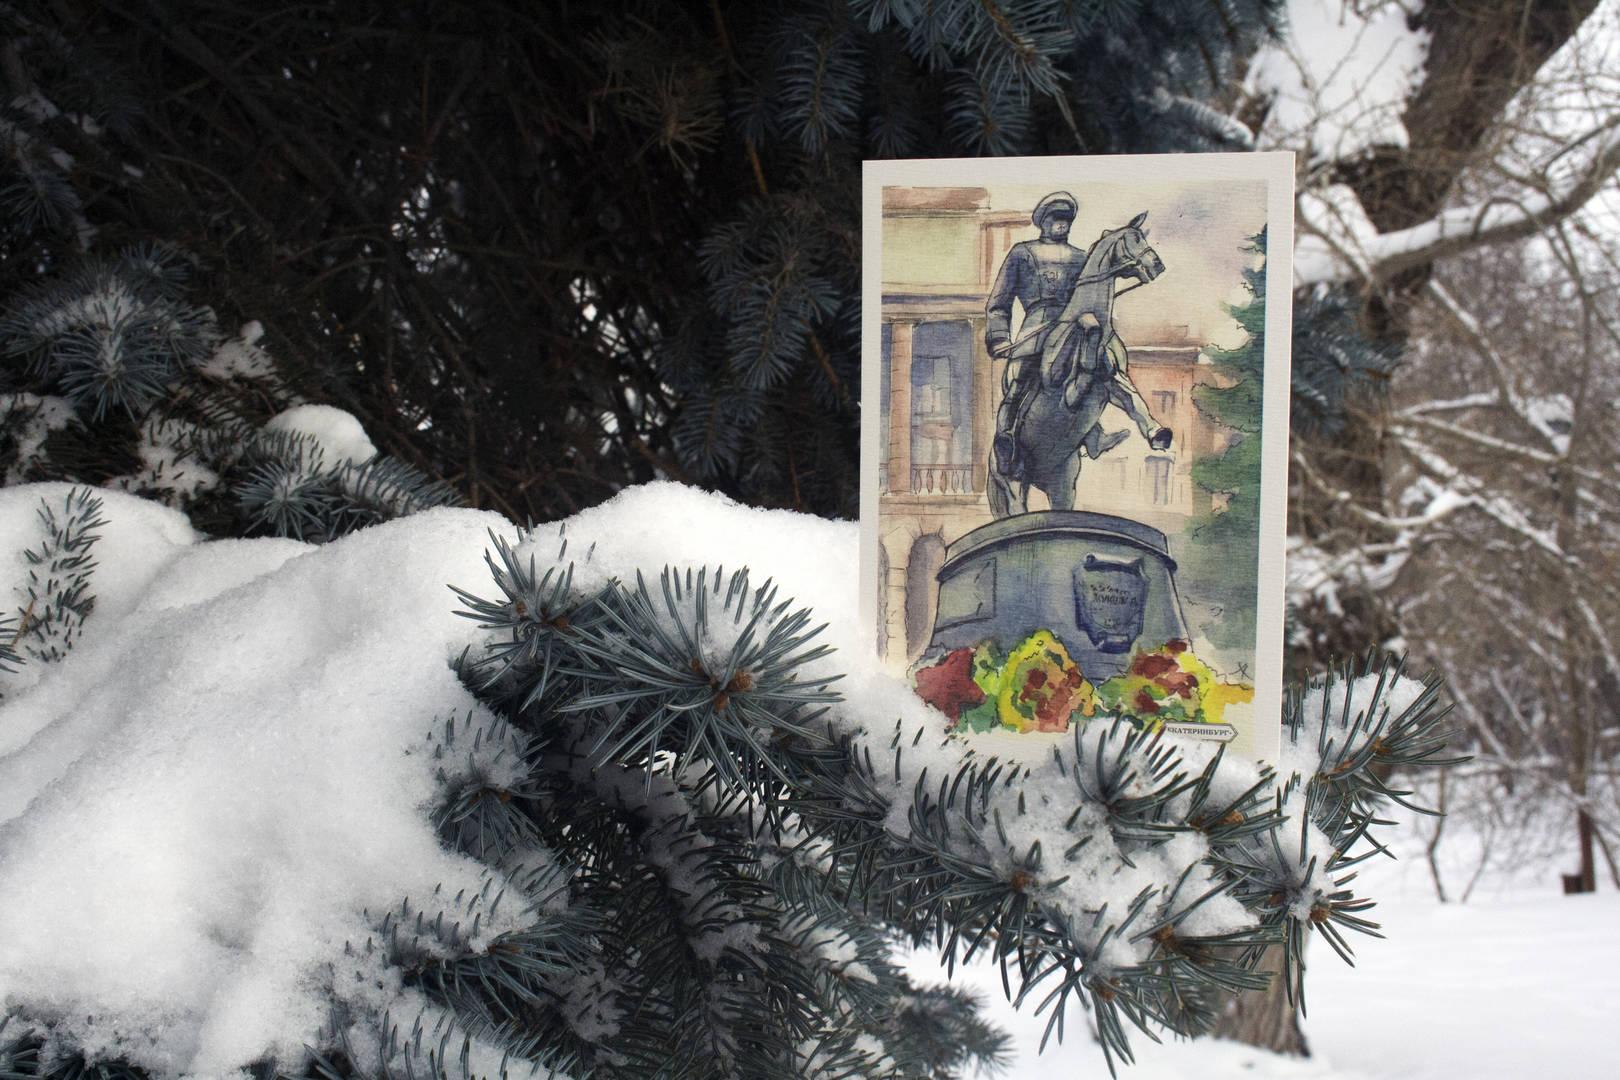 Памятник маршалу Жукову Екатеринбург, пр. Ленина, д. 71  Автор: Хорошева А.А.  The monument to marshal Zhukov Ekaterinburg, Lenin Avenue, 71  Artist: Horosheva A.A.